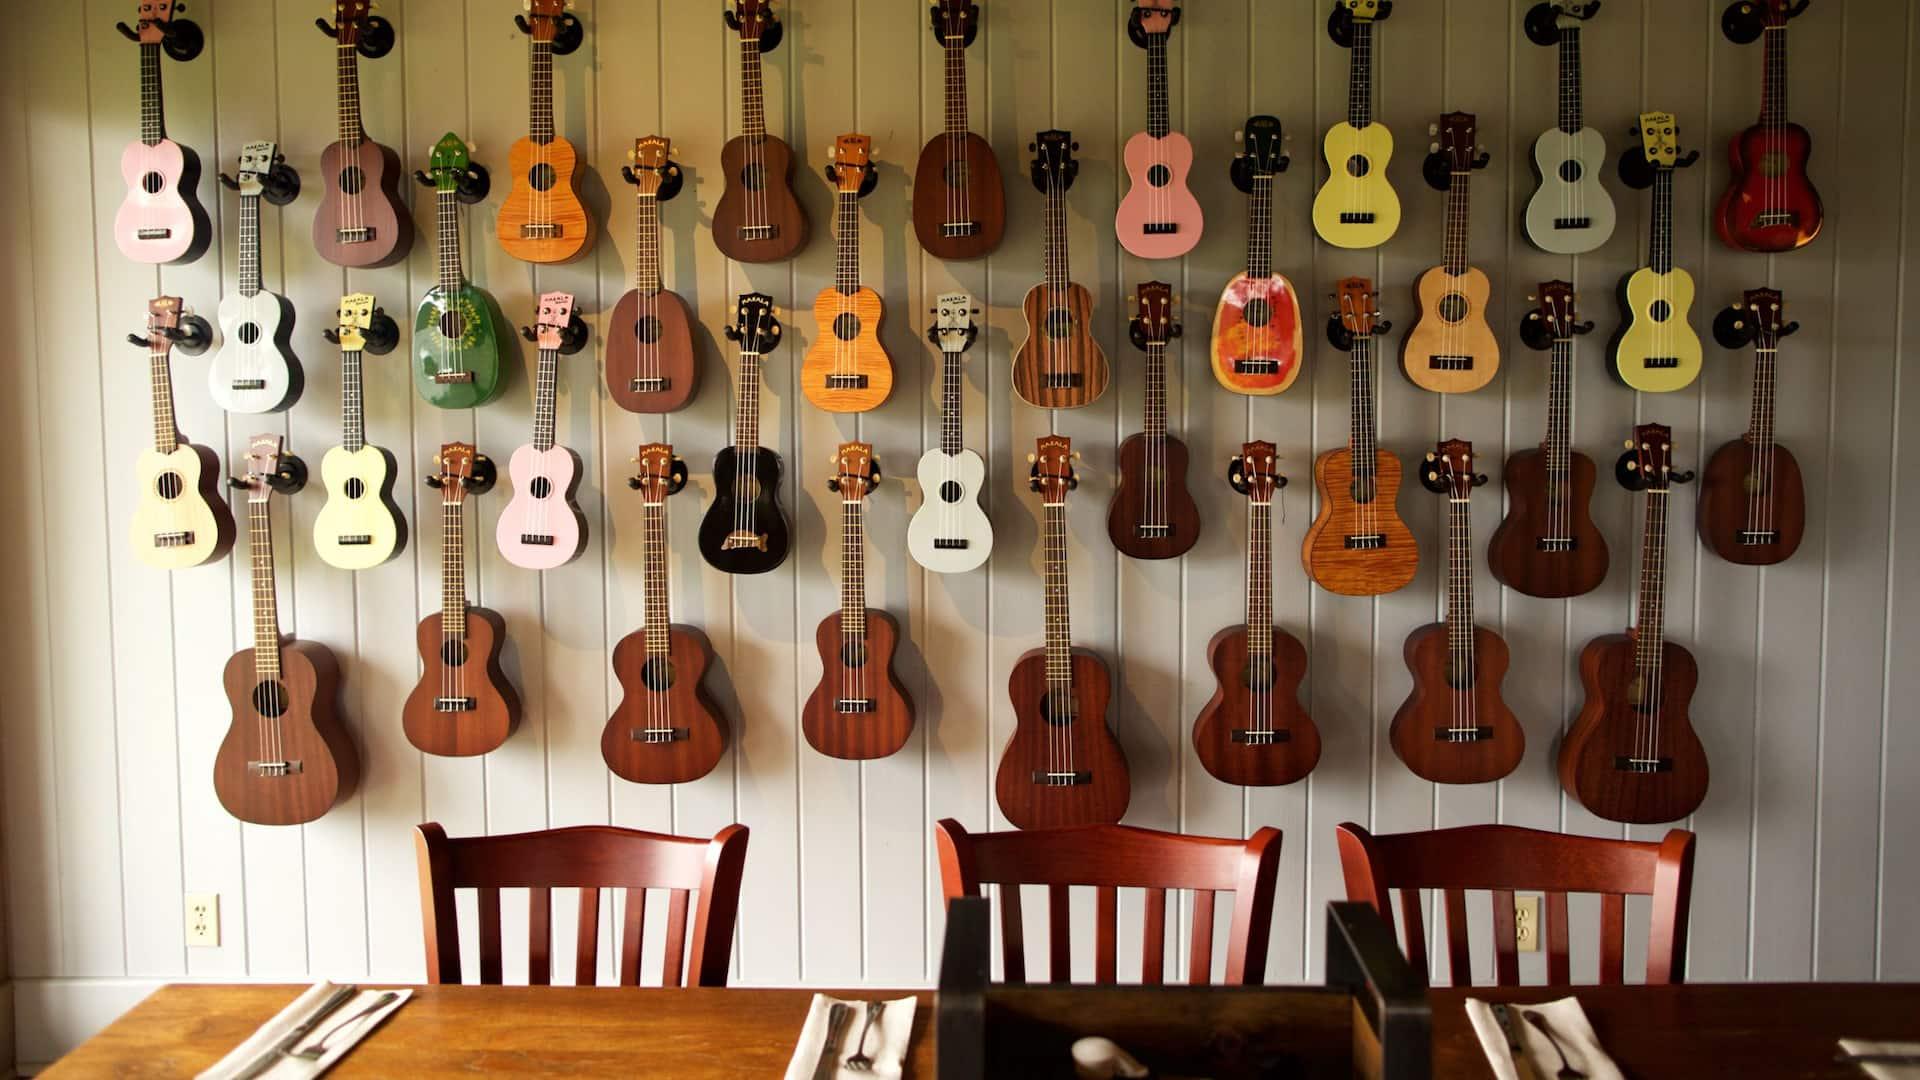 Ranch Restaurant Guitars